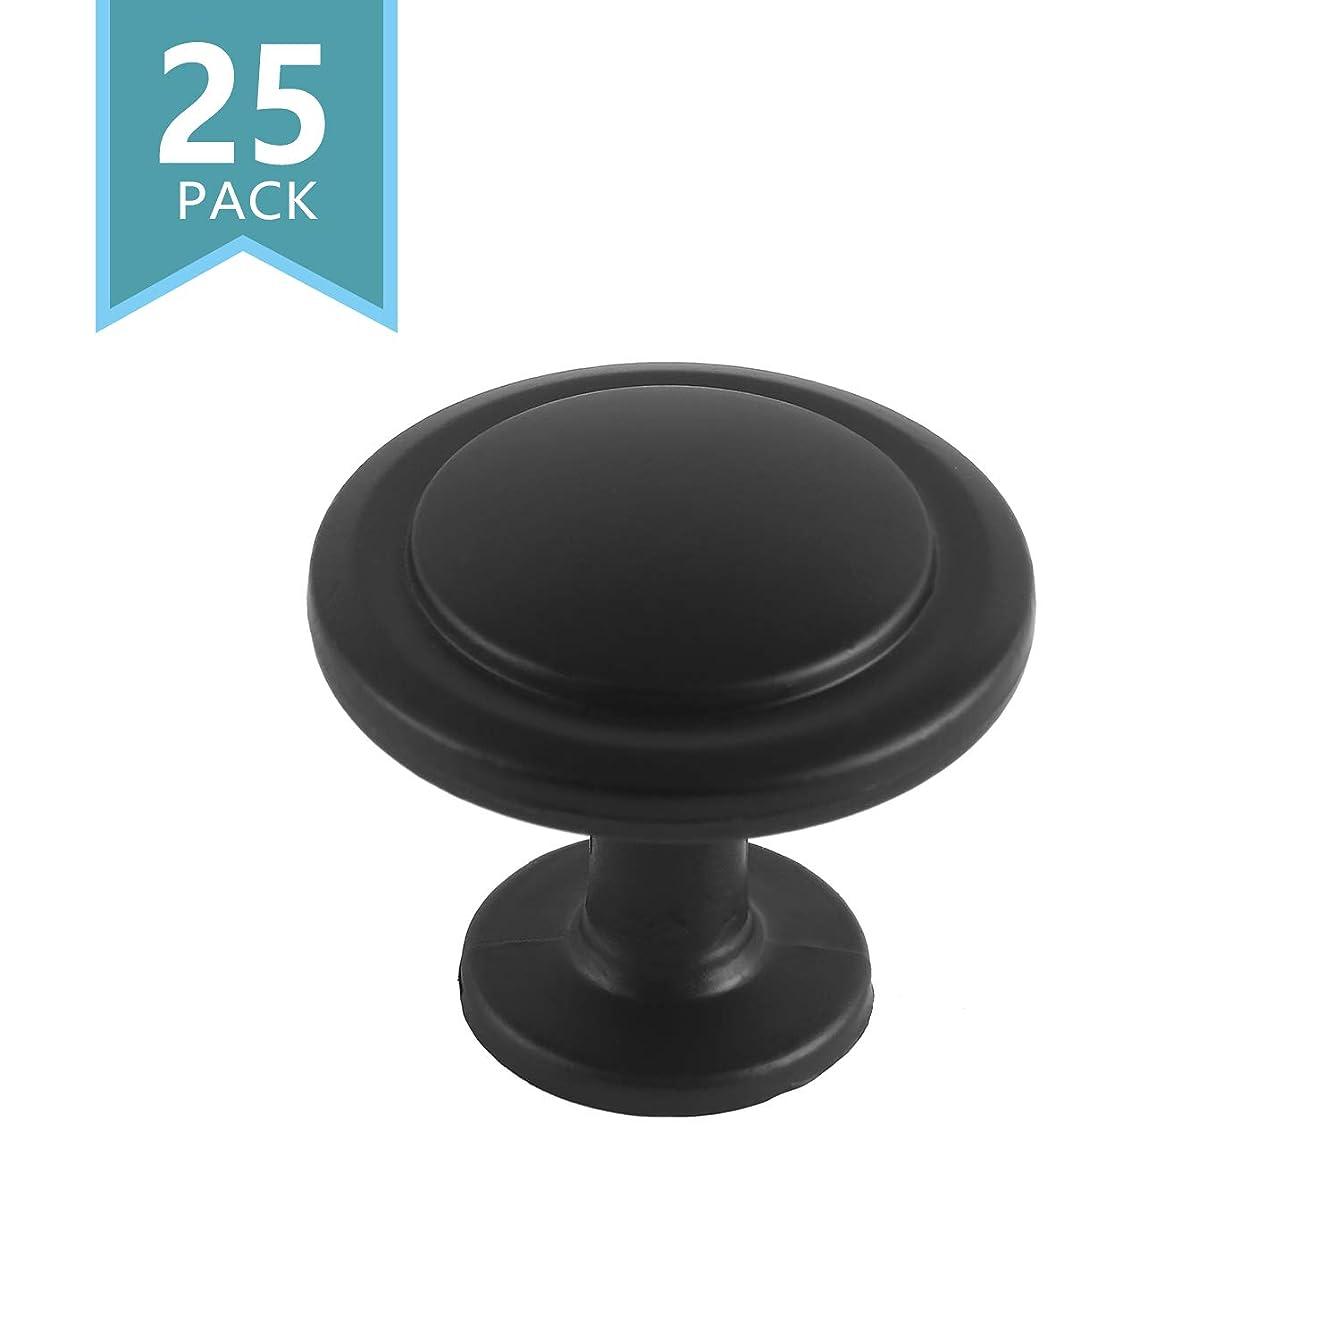 SMART ONYE Black Zinc Alloy Kitchen Cabinet Knobs-1-1/4